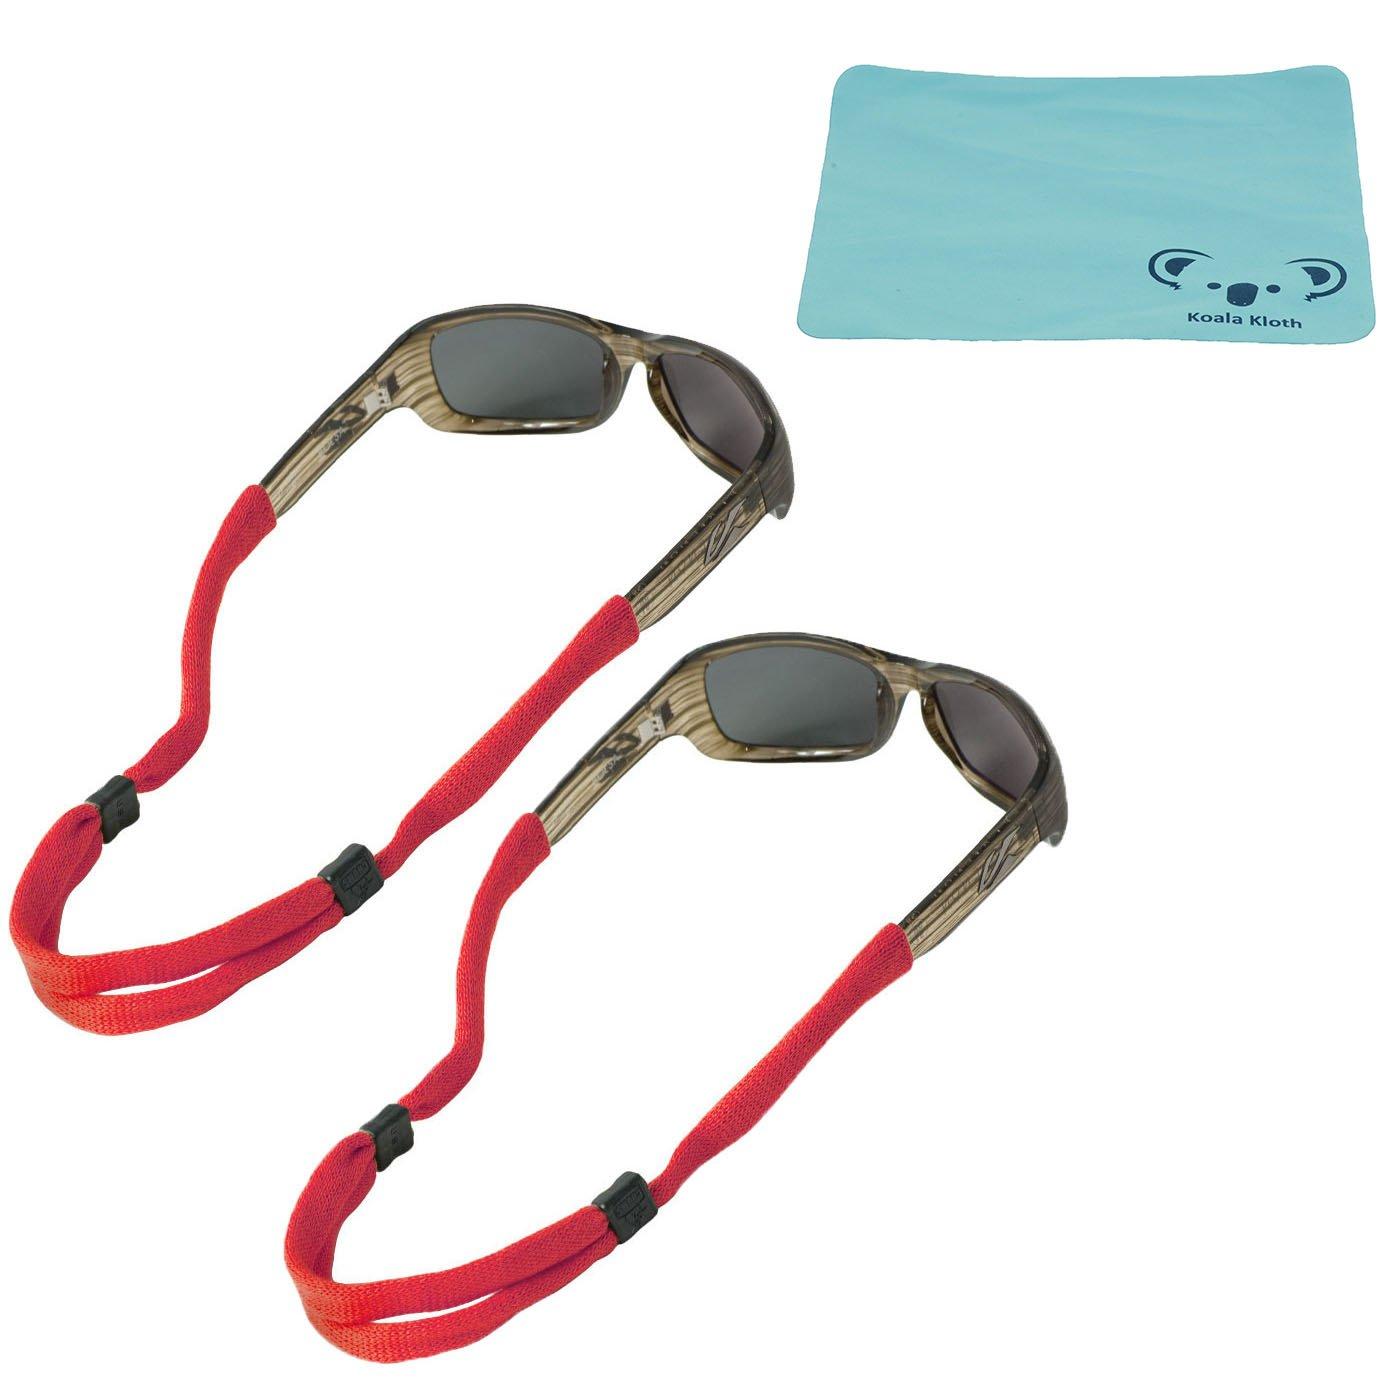 Chums | No Tailコットン眼鏡リテイナーサングラスストラップ|調整可能な眼鏡&スポーツメガネホルダーKeeper Lanyard | 2pkバンドル+布 B01MTD7MIB 2pkバンドル+布 レッド レッド レッド, 紀州 器楽や:f614fe85 --- verkokajak.se